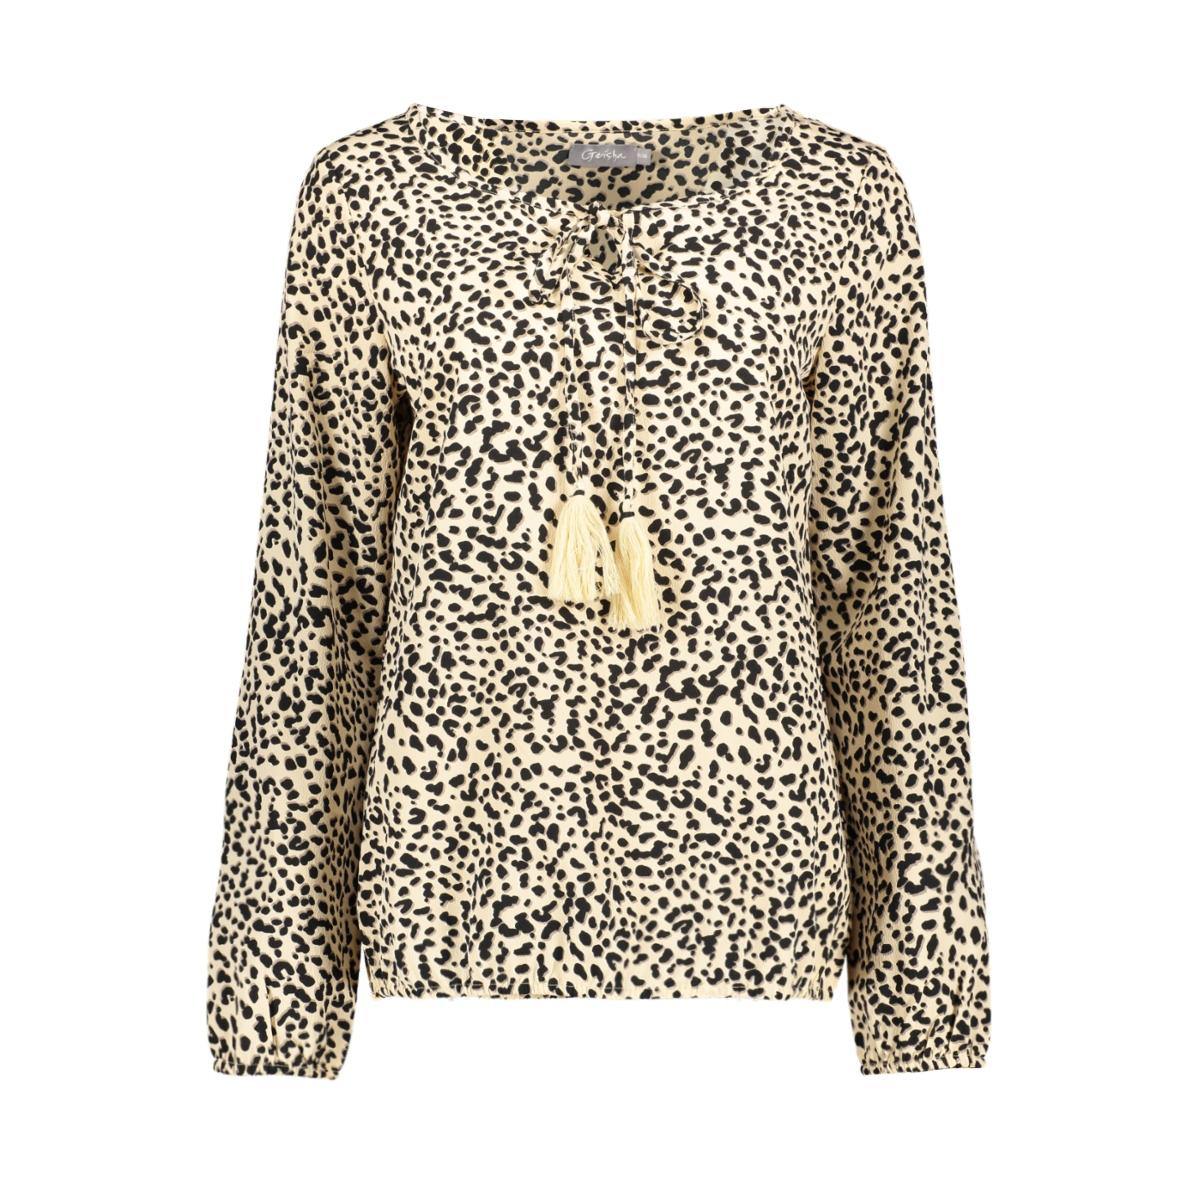 top leoprad cord tassels 0309121 geisha blouse sand/black